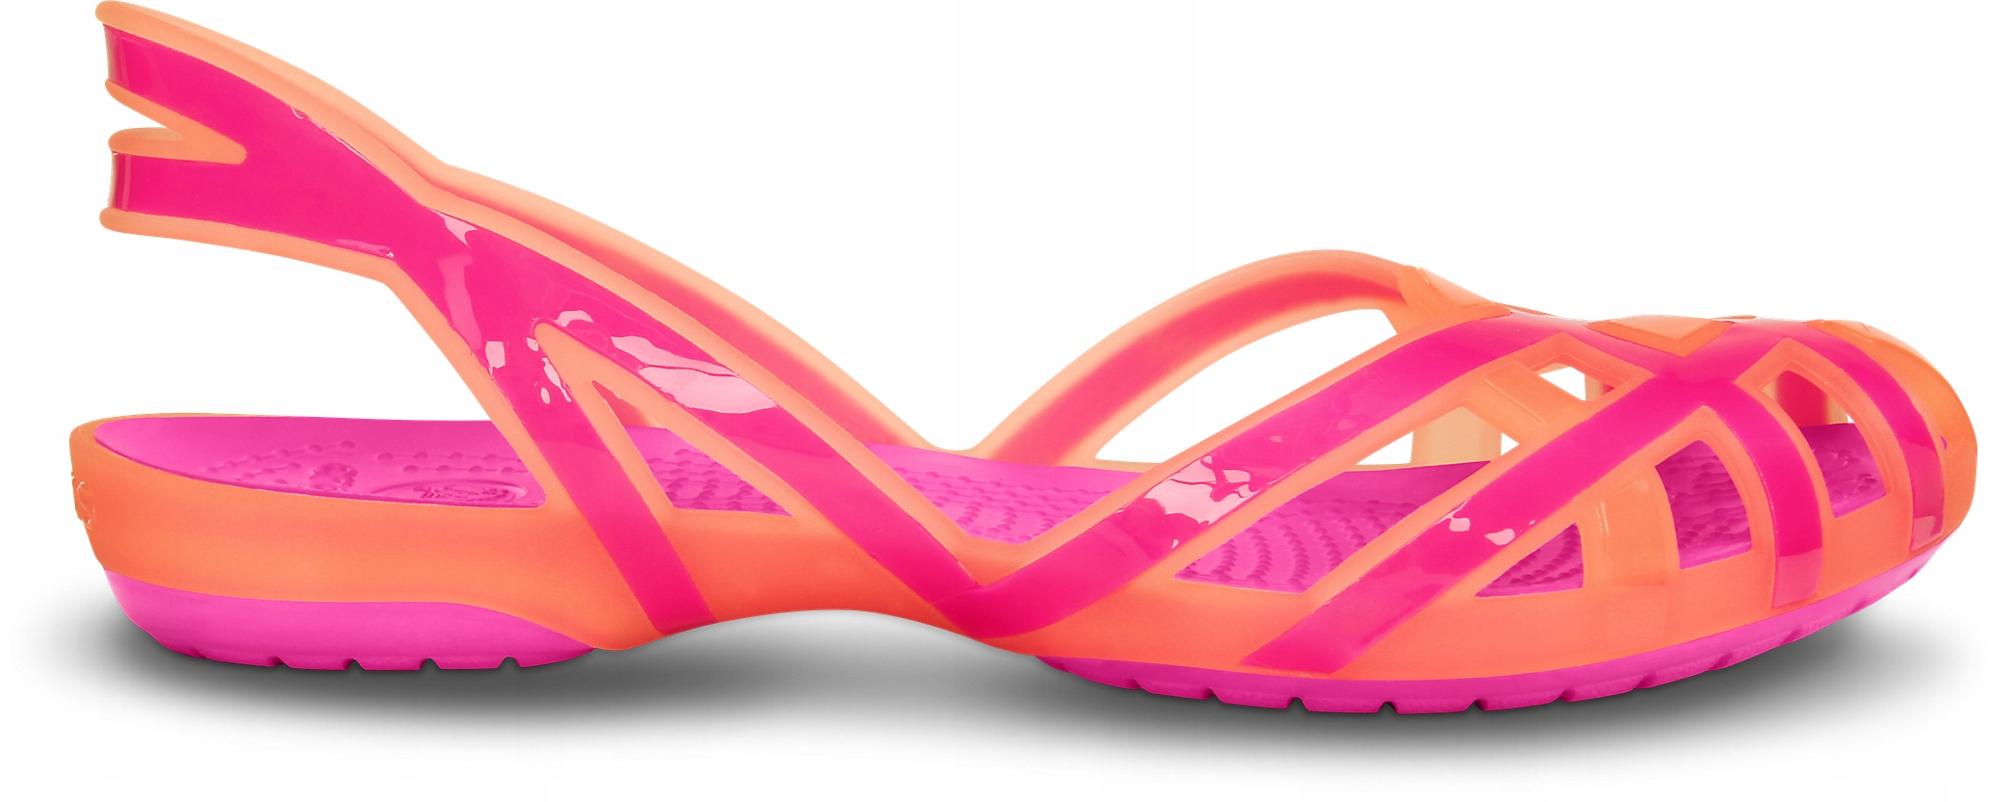 Damskie sandały Huarache slingback różowe 36-37 J4